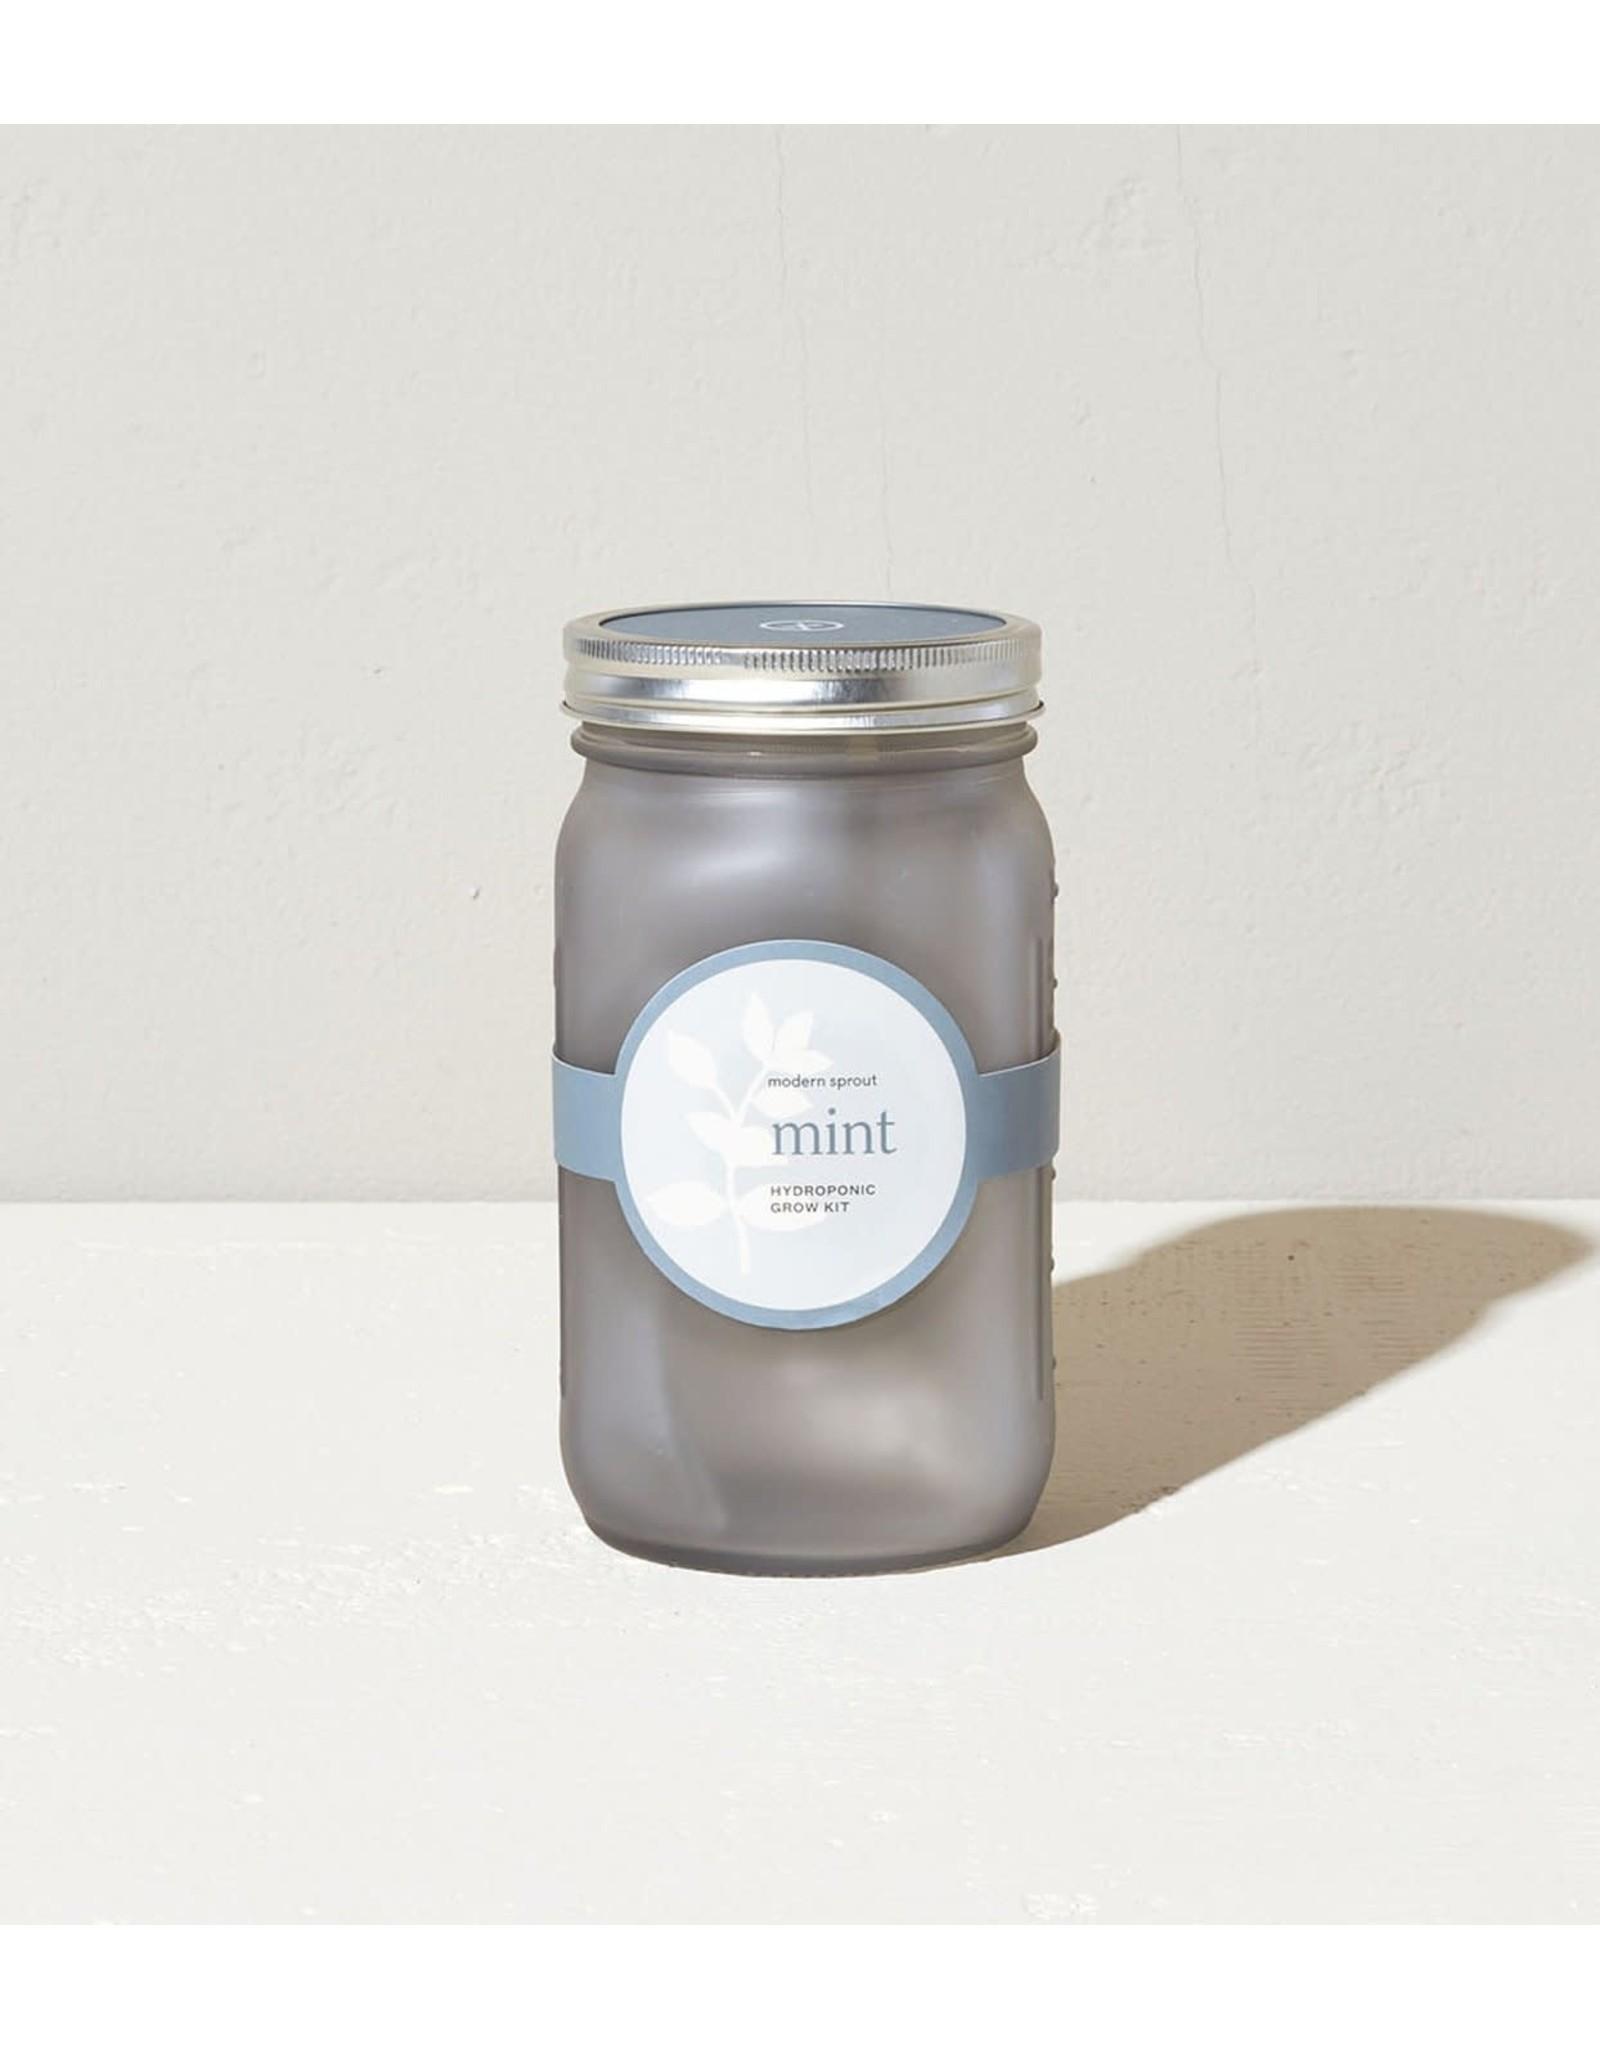 Modern Sprout Mint Garden Jar